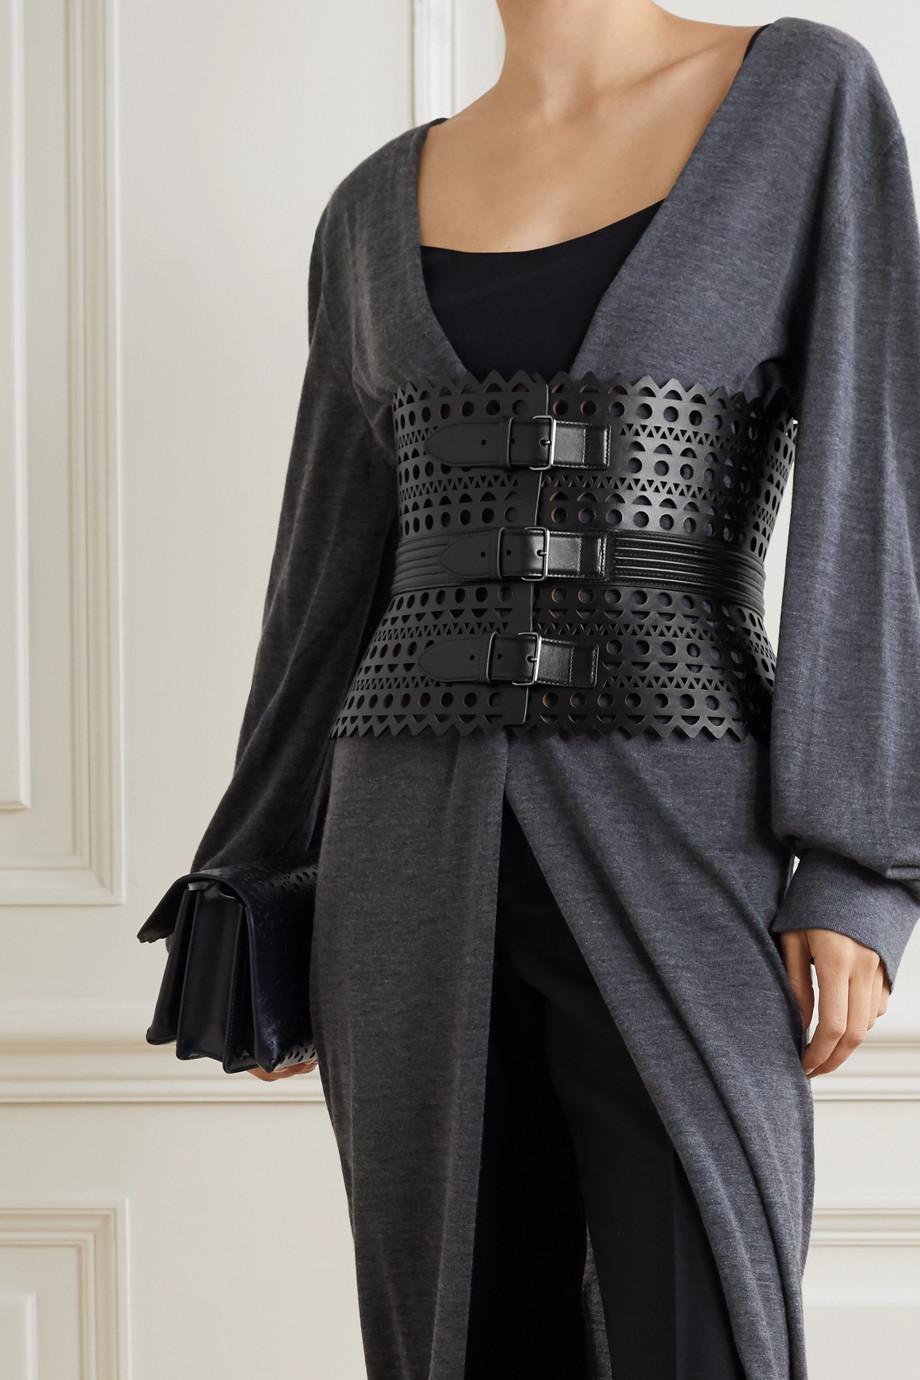 Alaïa Taillengürtel aus lasergeschnittenem Leder